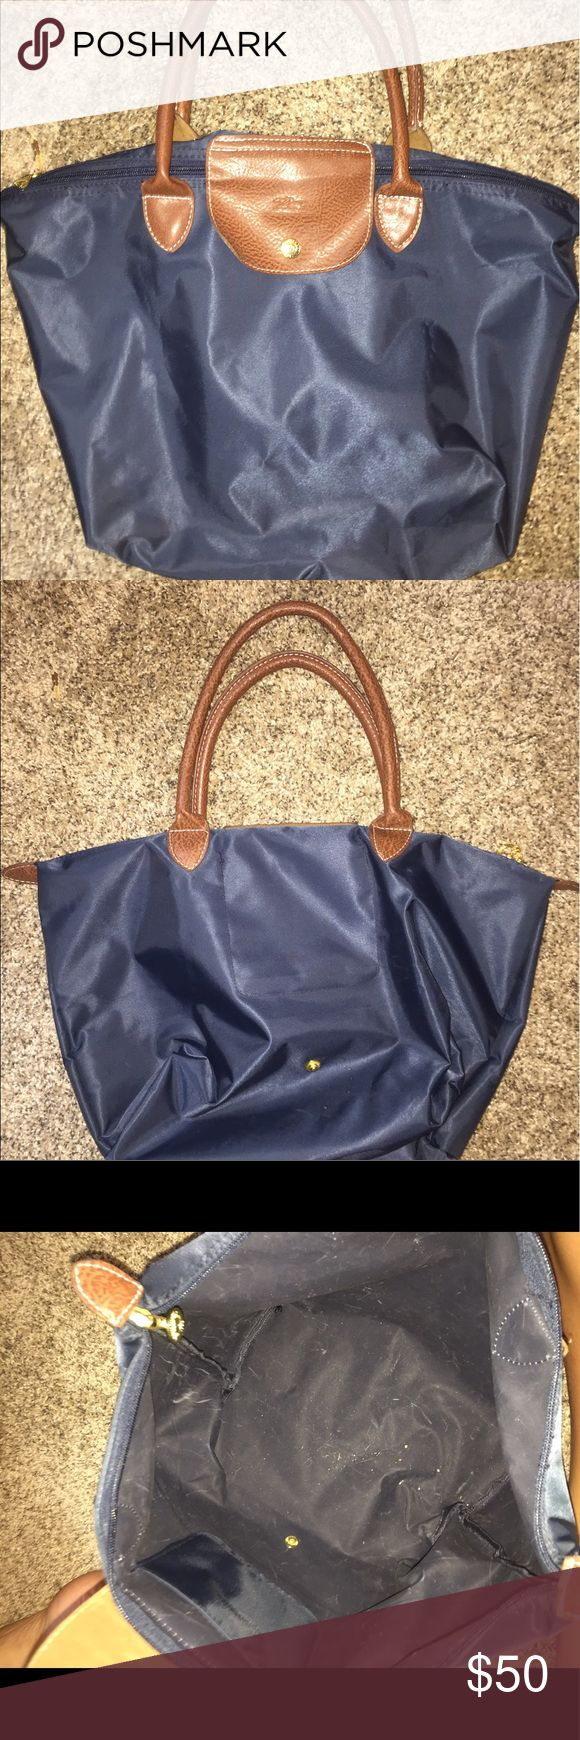 Long champ bag Small used navy long champ bag Bags Shoulder Bags